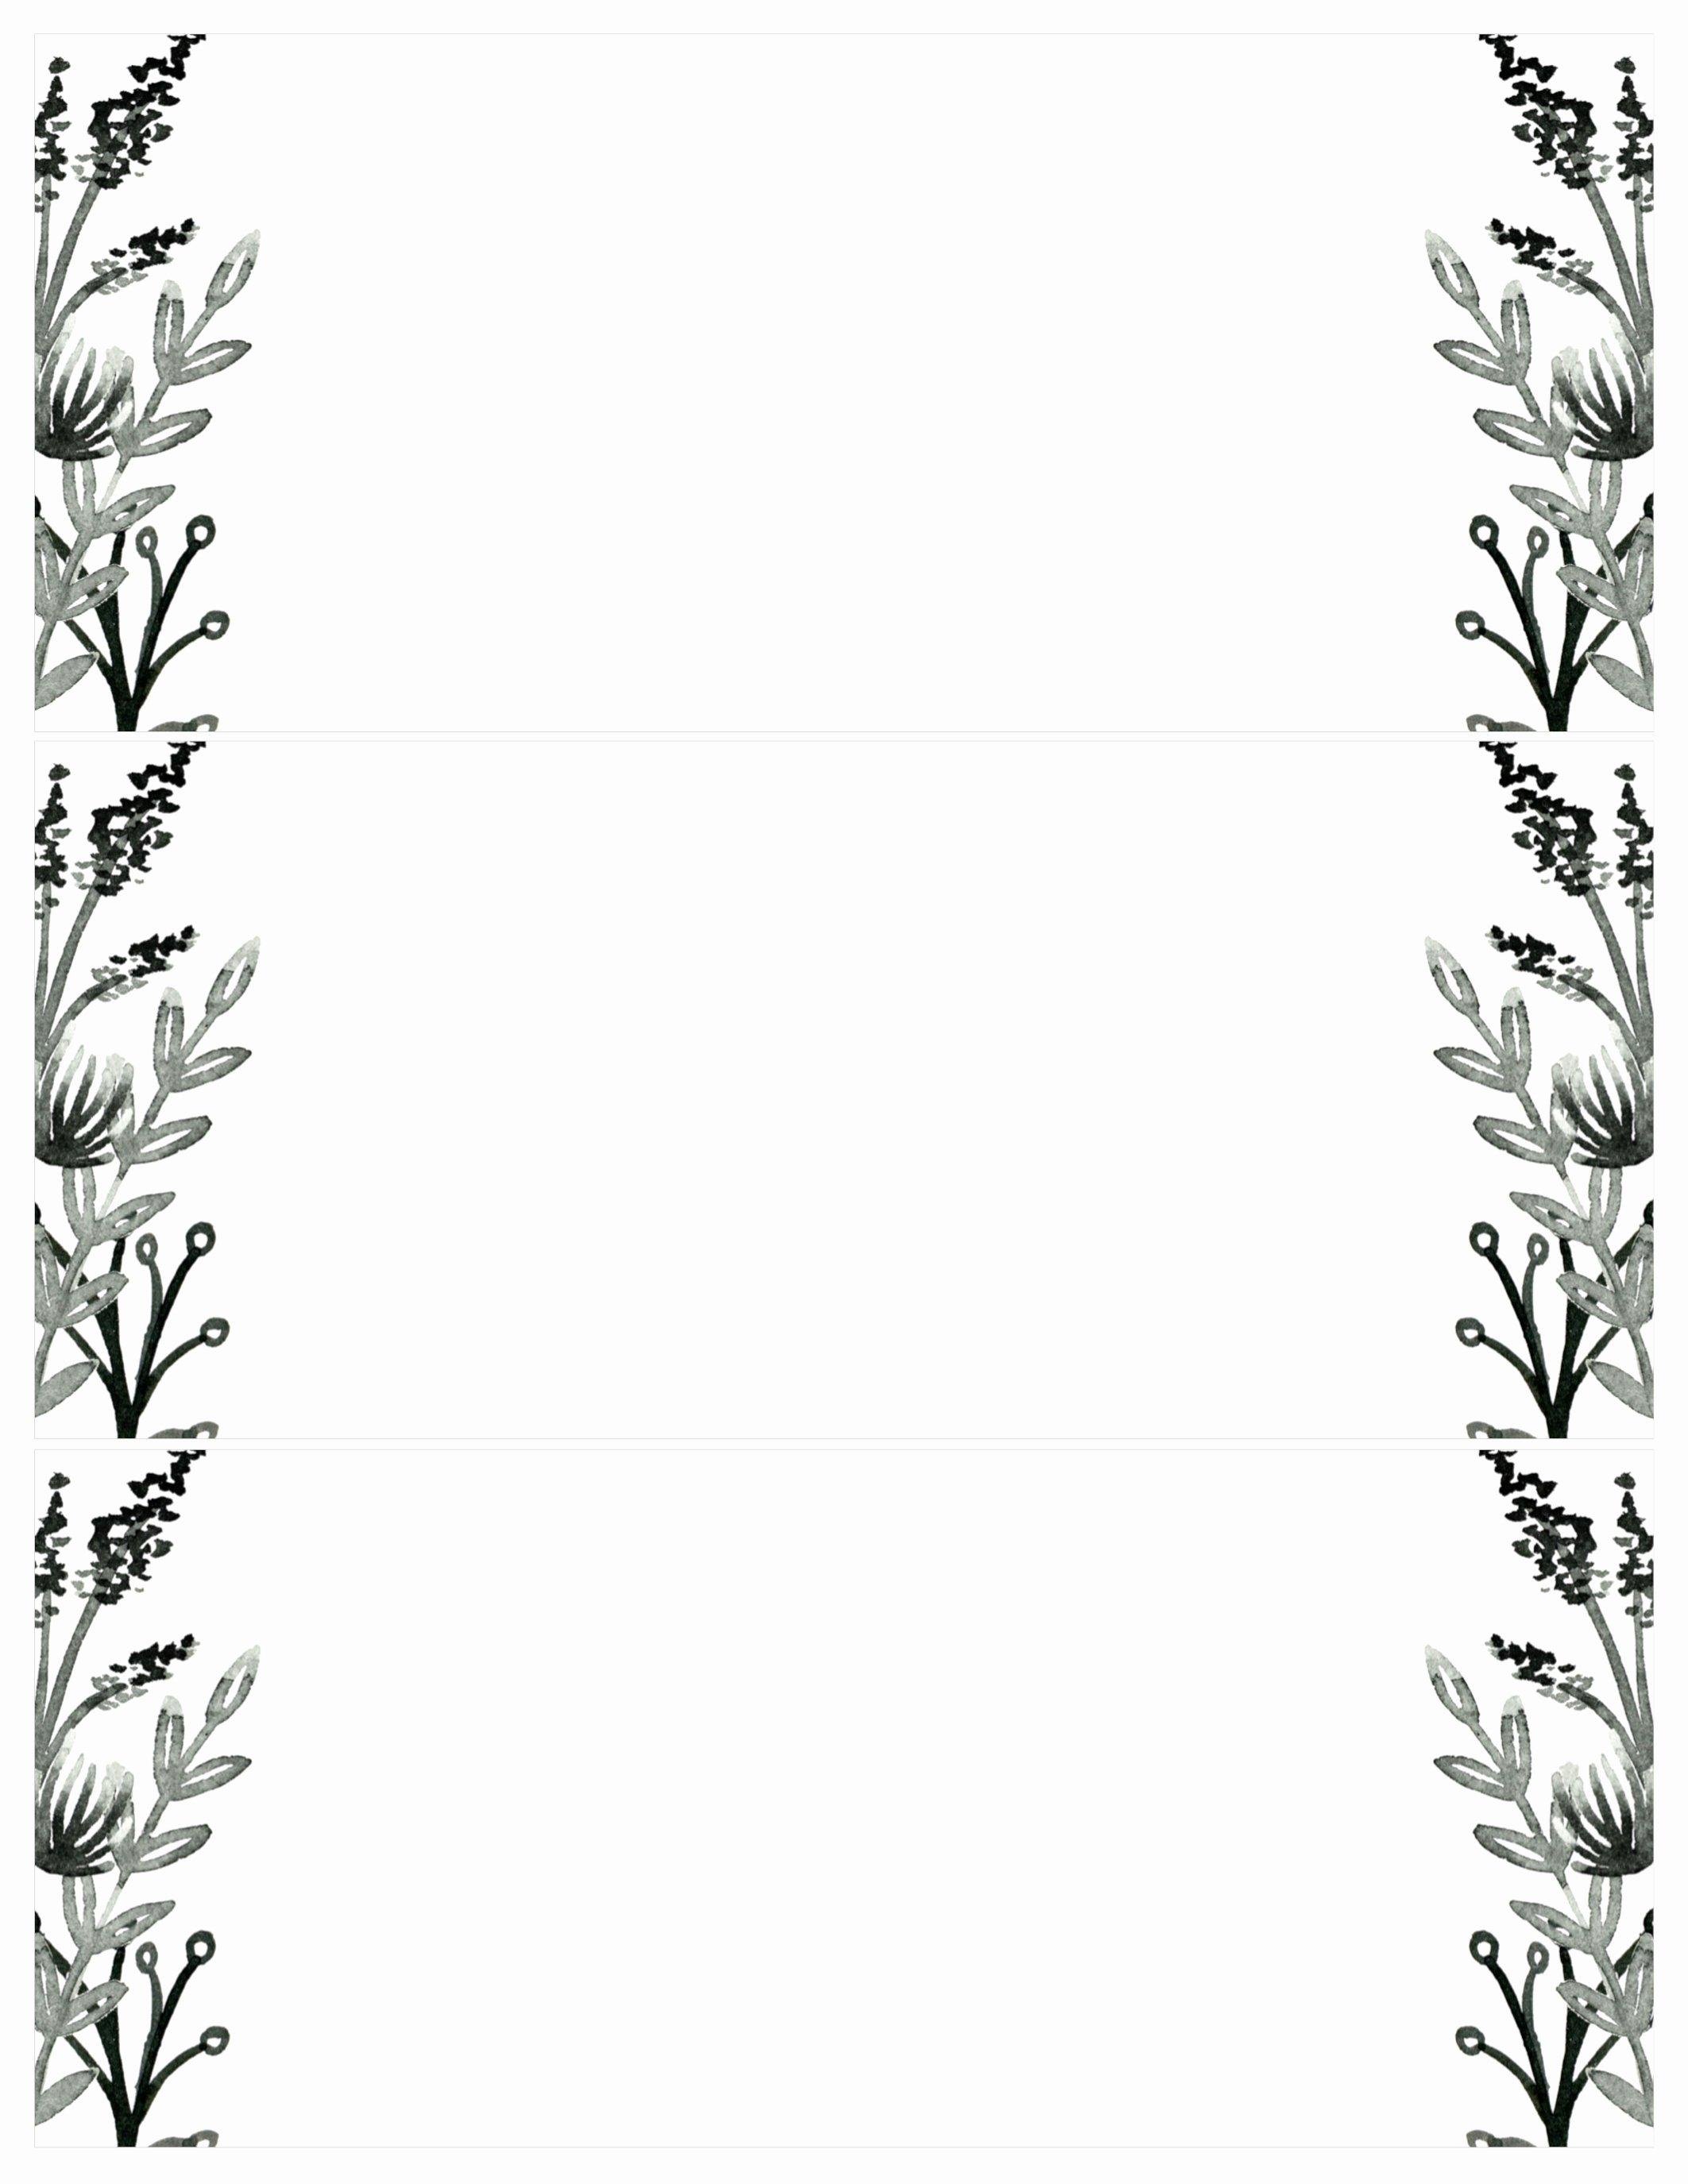 Black White Flowers Invitations Templates Free Printable Paper Trail Design